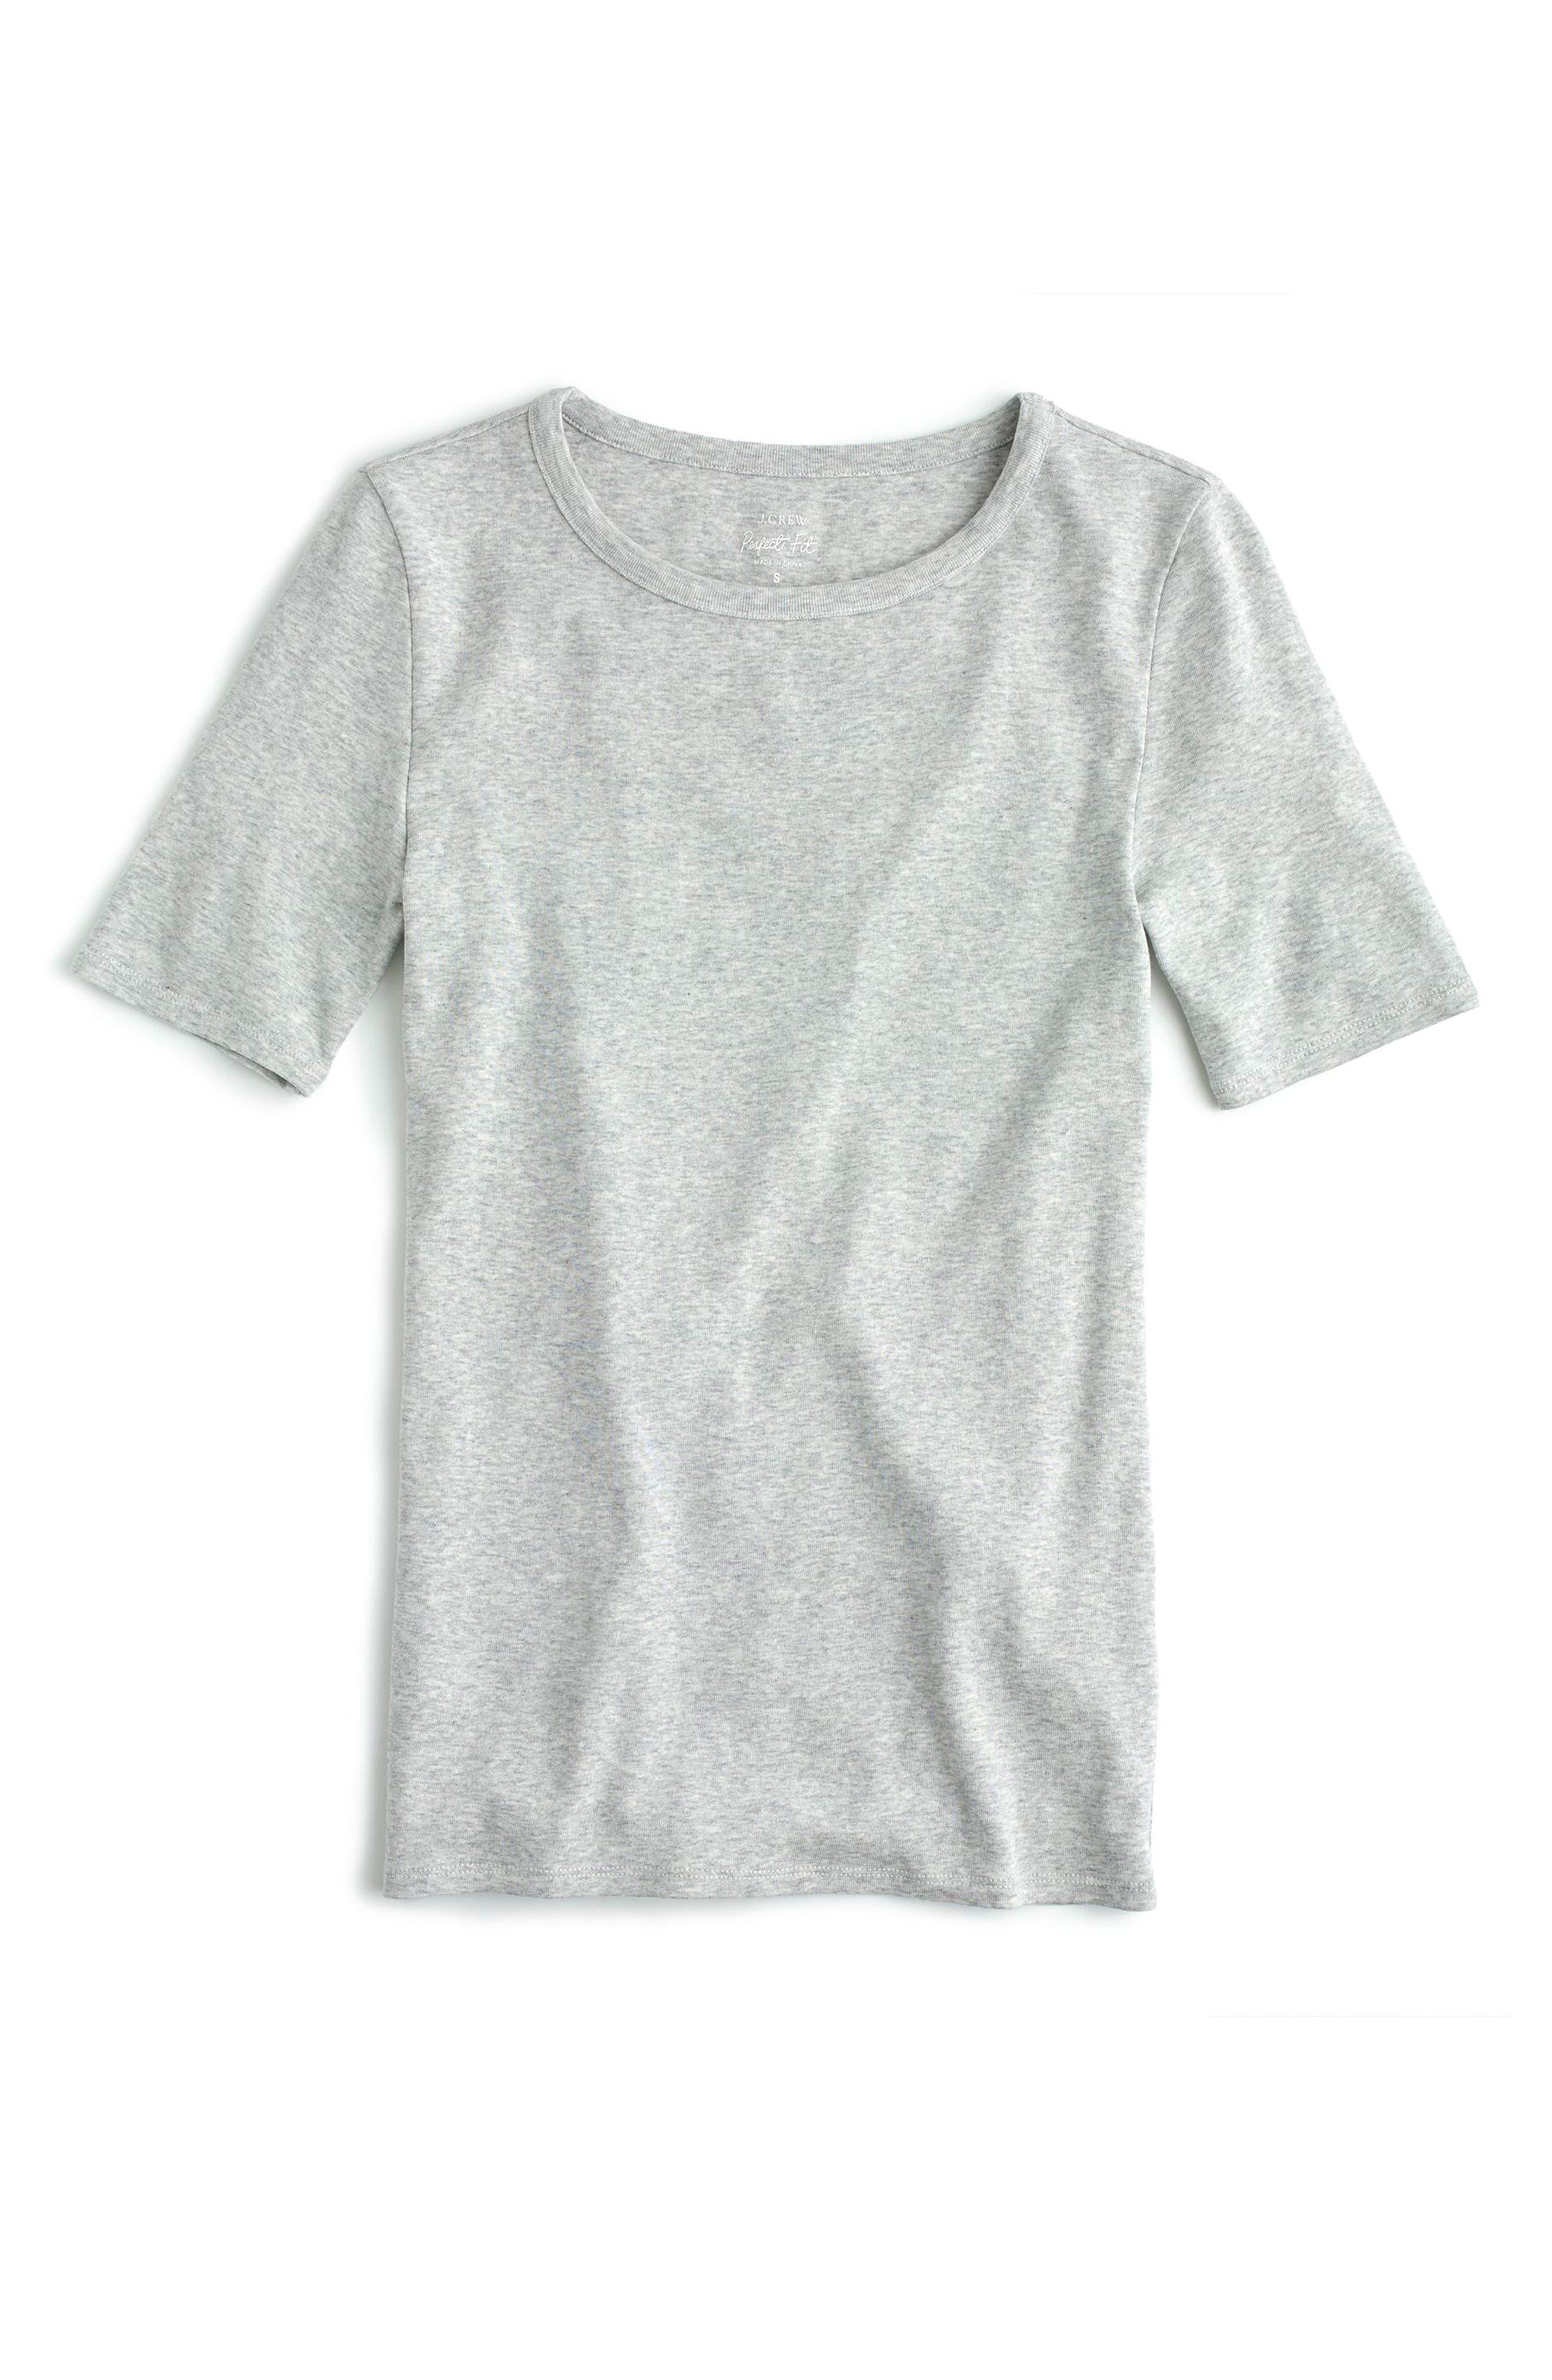 J.Crew New Perfect Fit T-Shirt,                             Main thumbnail 1, color,                             Heather Dusk